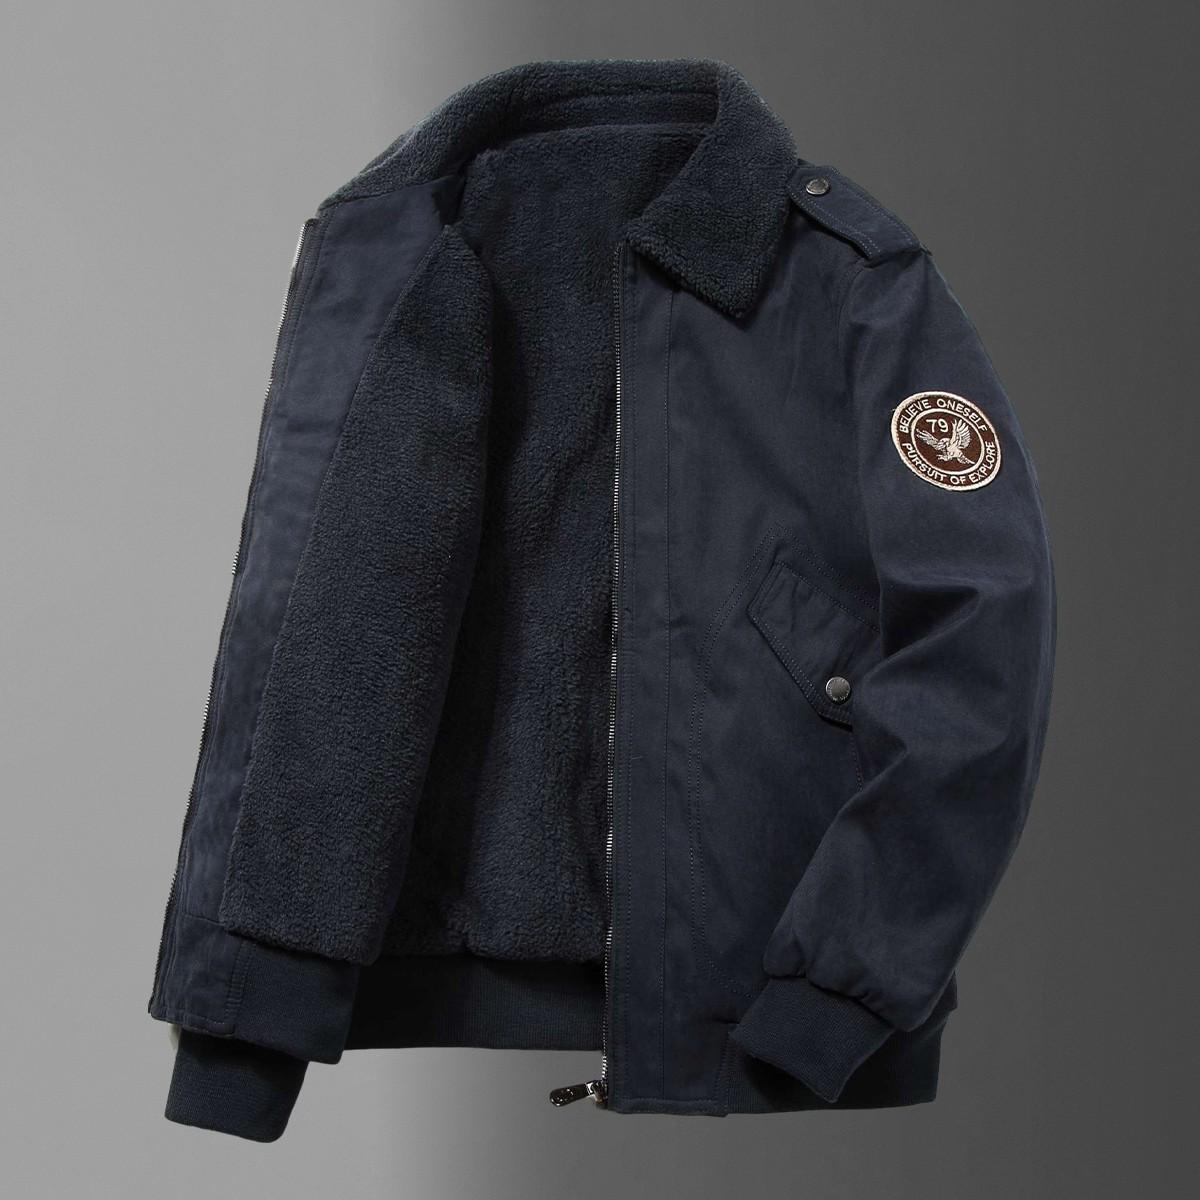 U.S. POLO ASSN 美国马球协会 MY2126813304  男士棉服